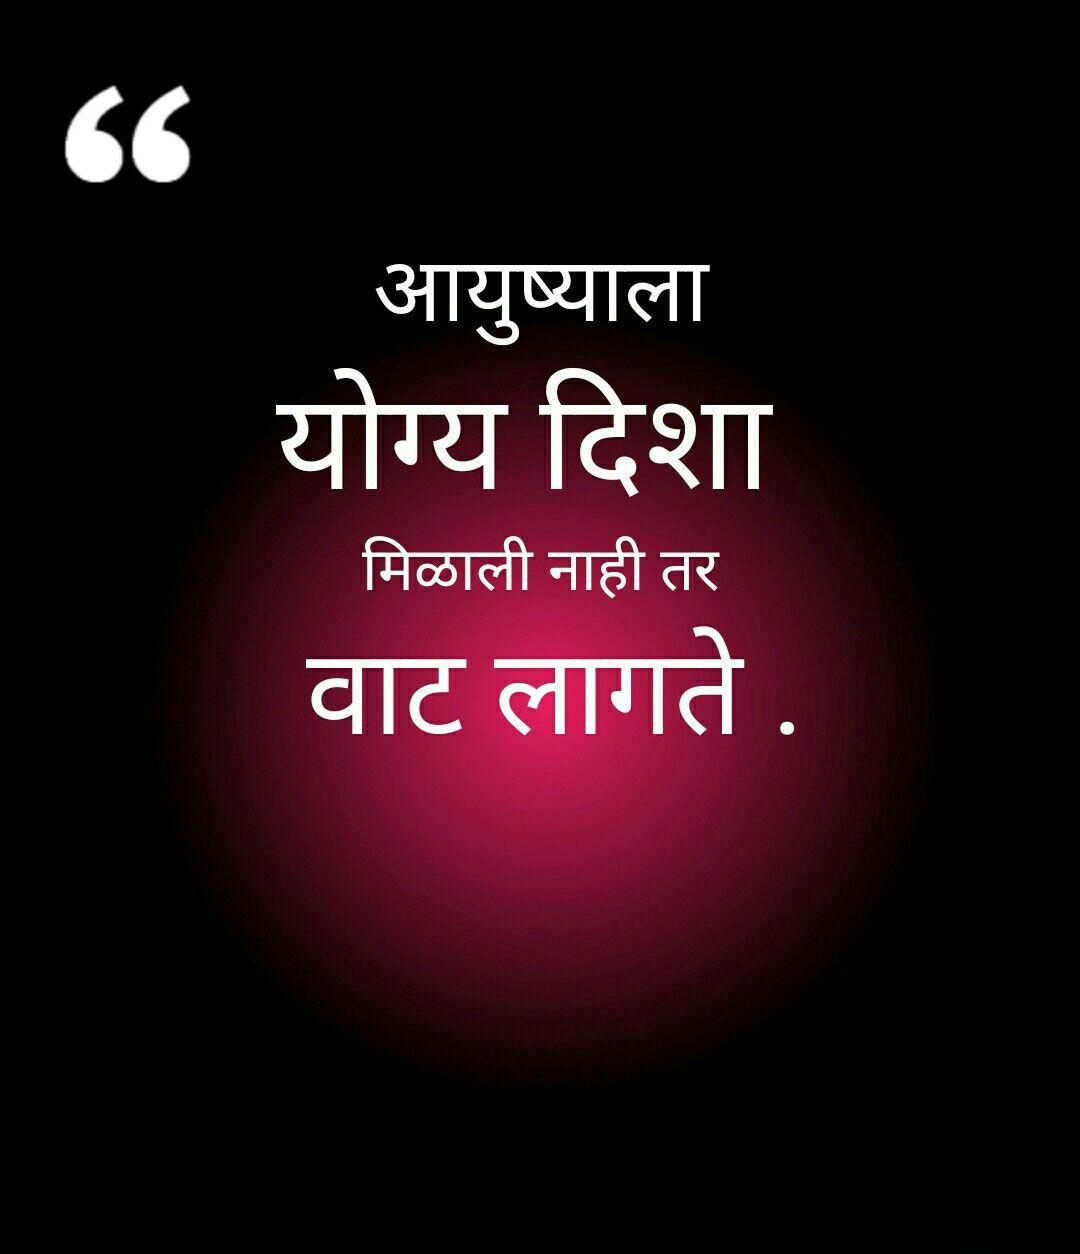 Gm okay | gm okay | Life quotes, Hindi quotes, Marathi quotes